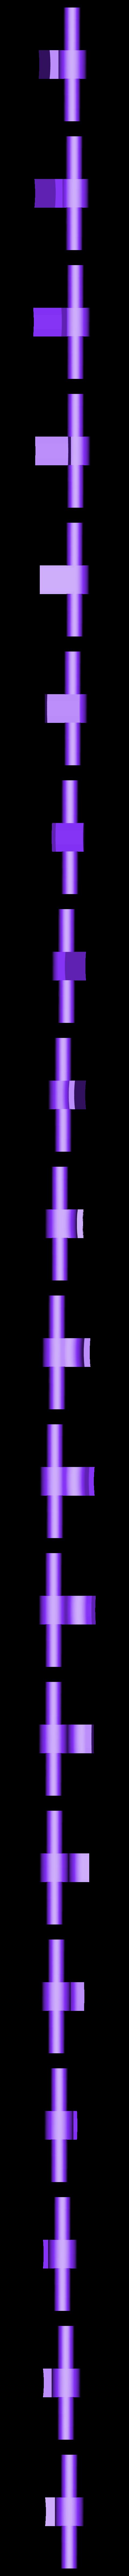 Hinge_LowerPart.stl Download free STL file Jars from bottles • 3D print design, Matlek